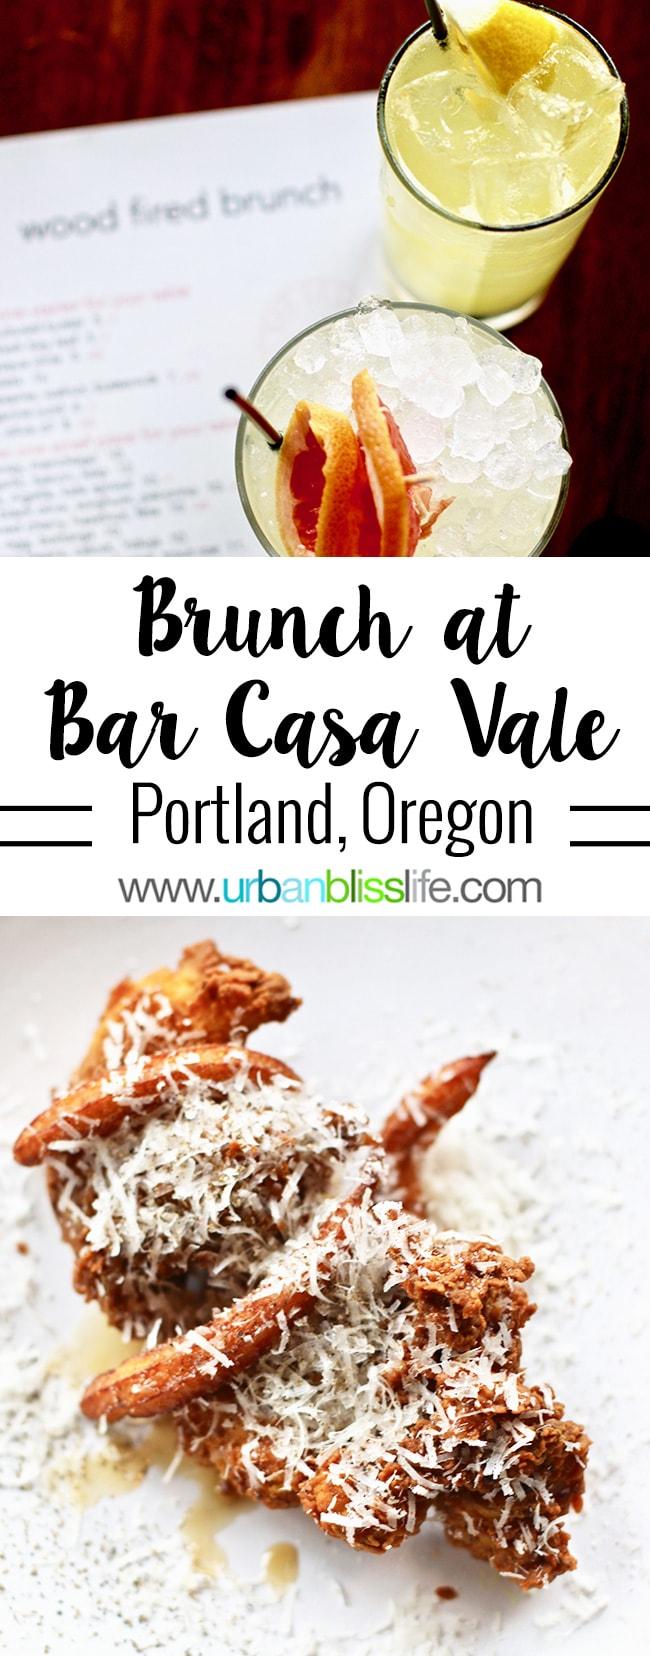 Bar Casa Vale Brunch in Portland, Oregon